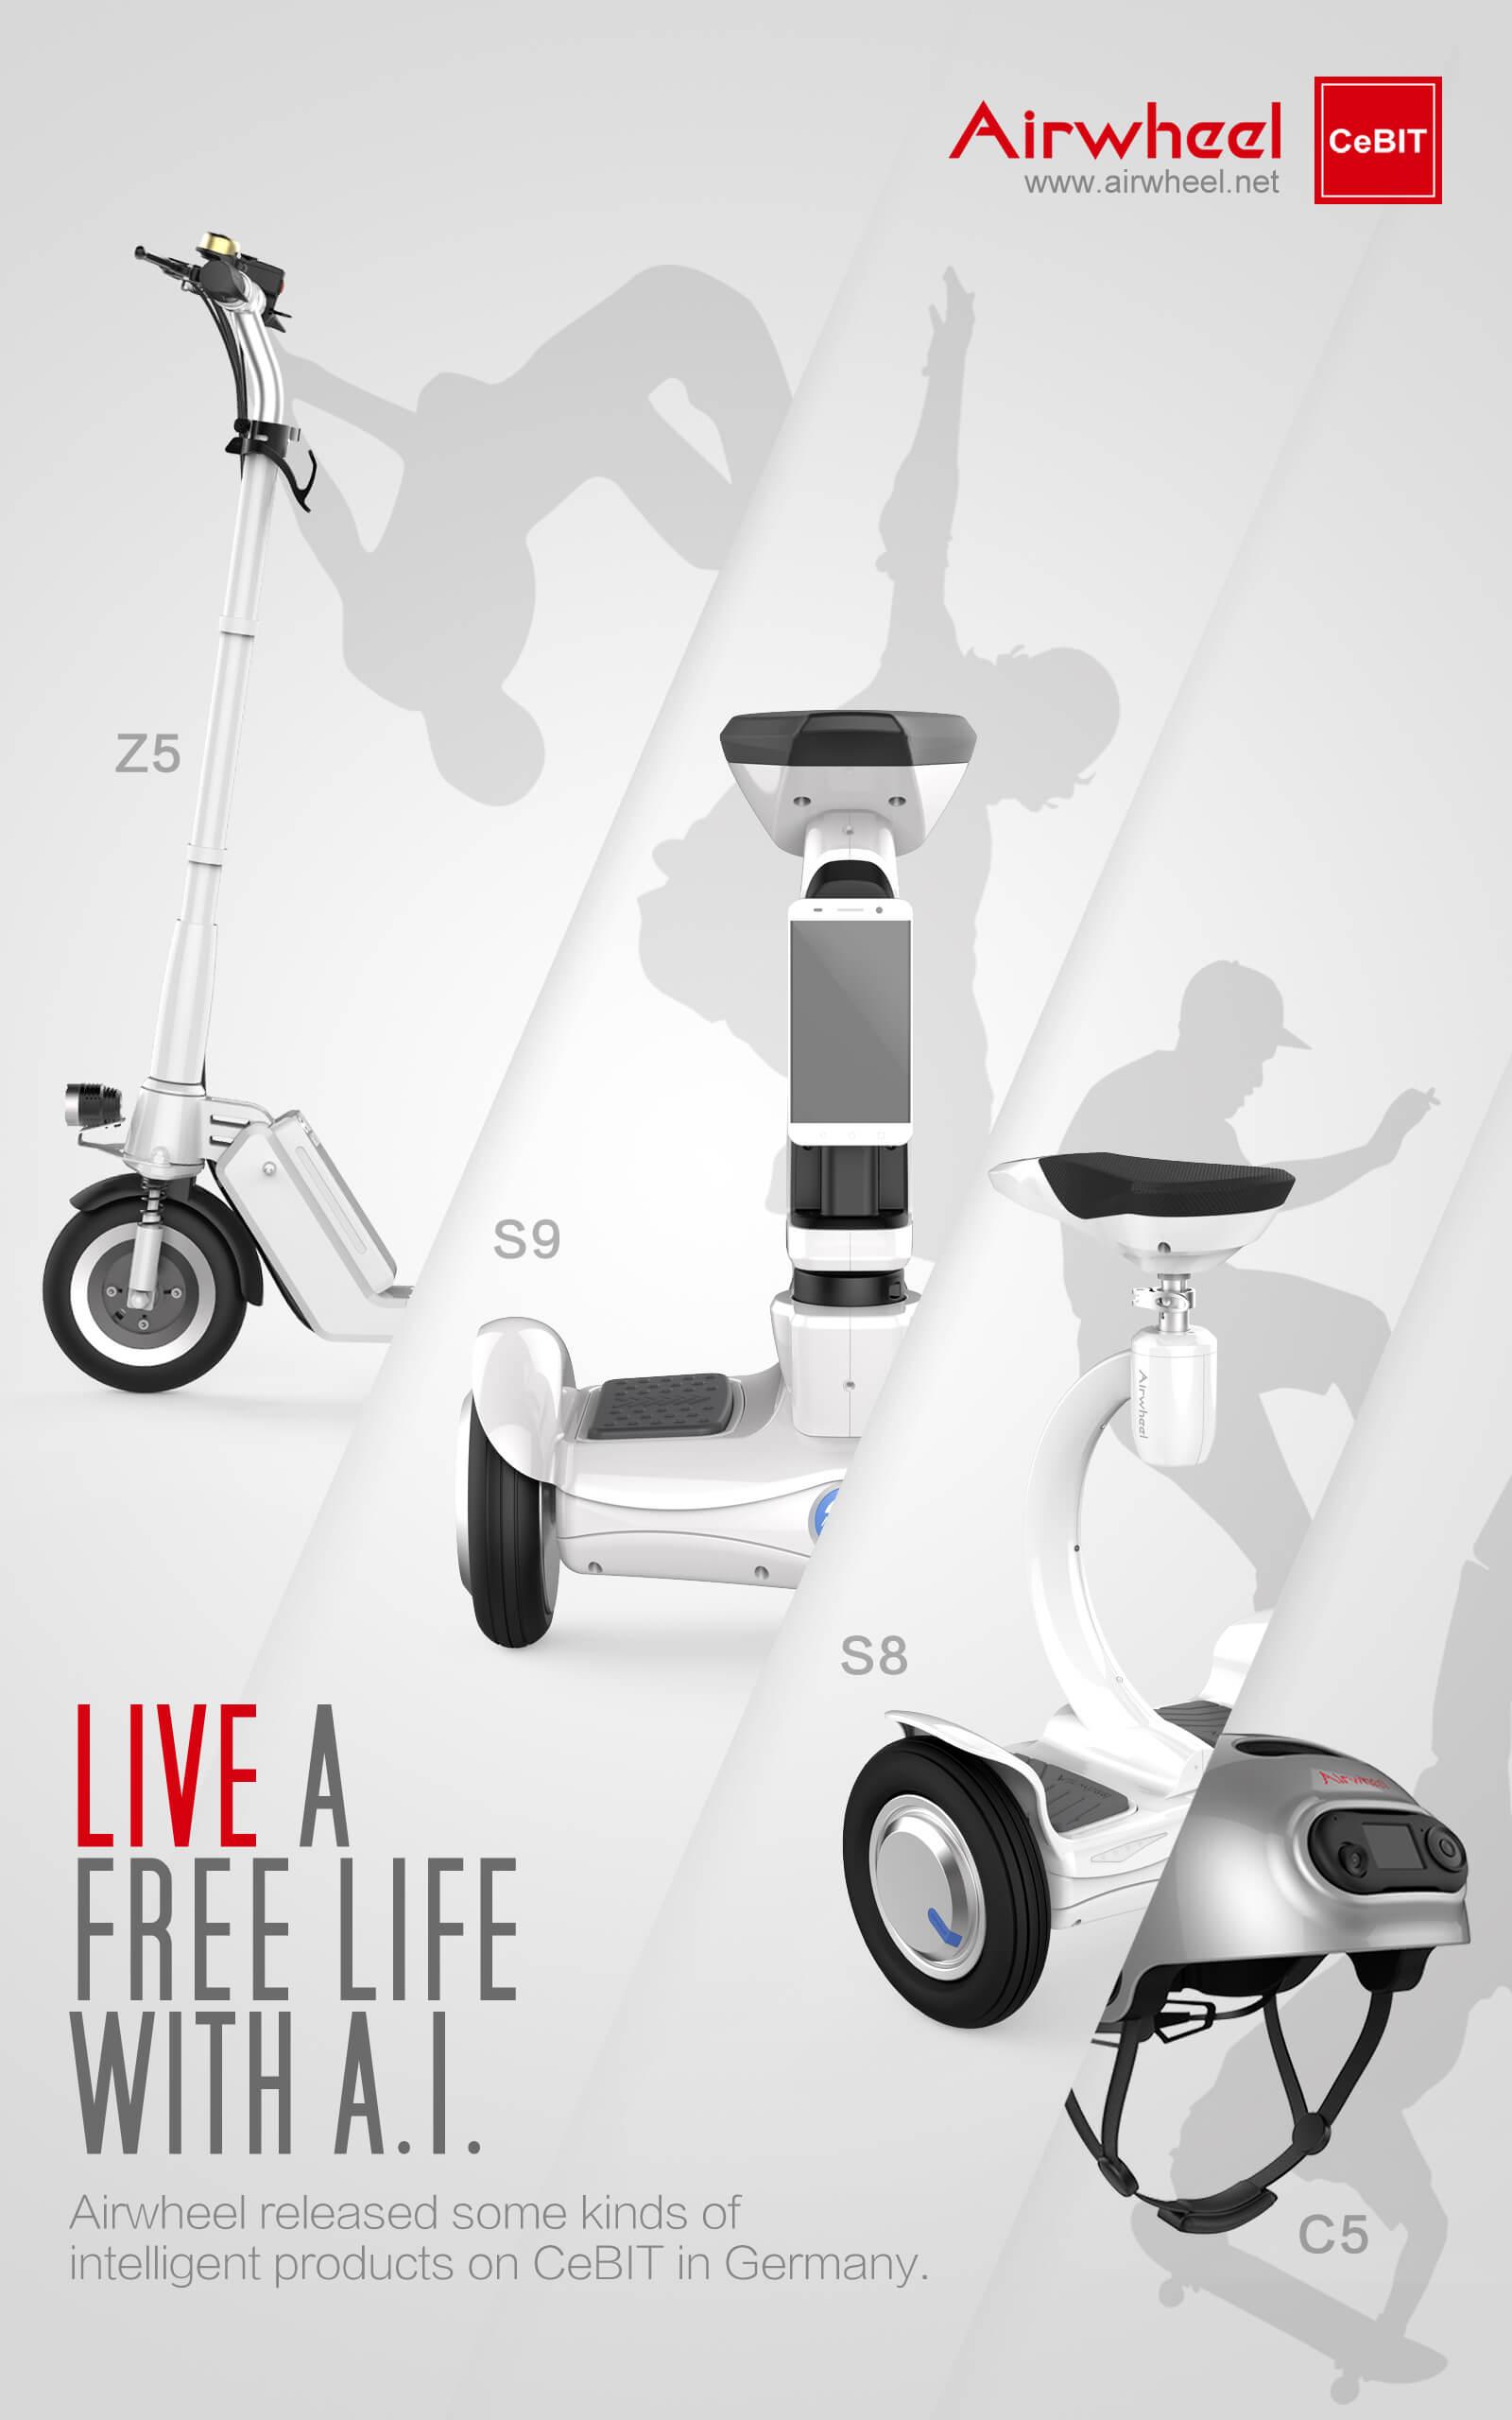 monociclo eléctrica Airwheel